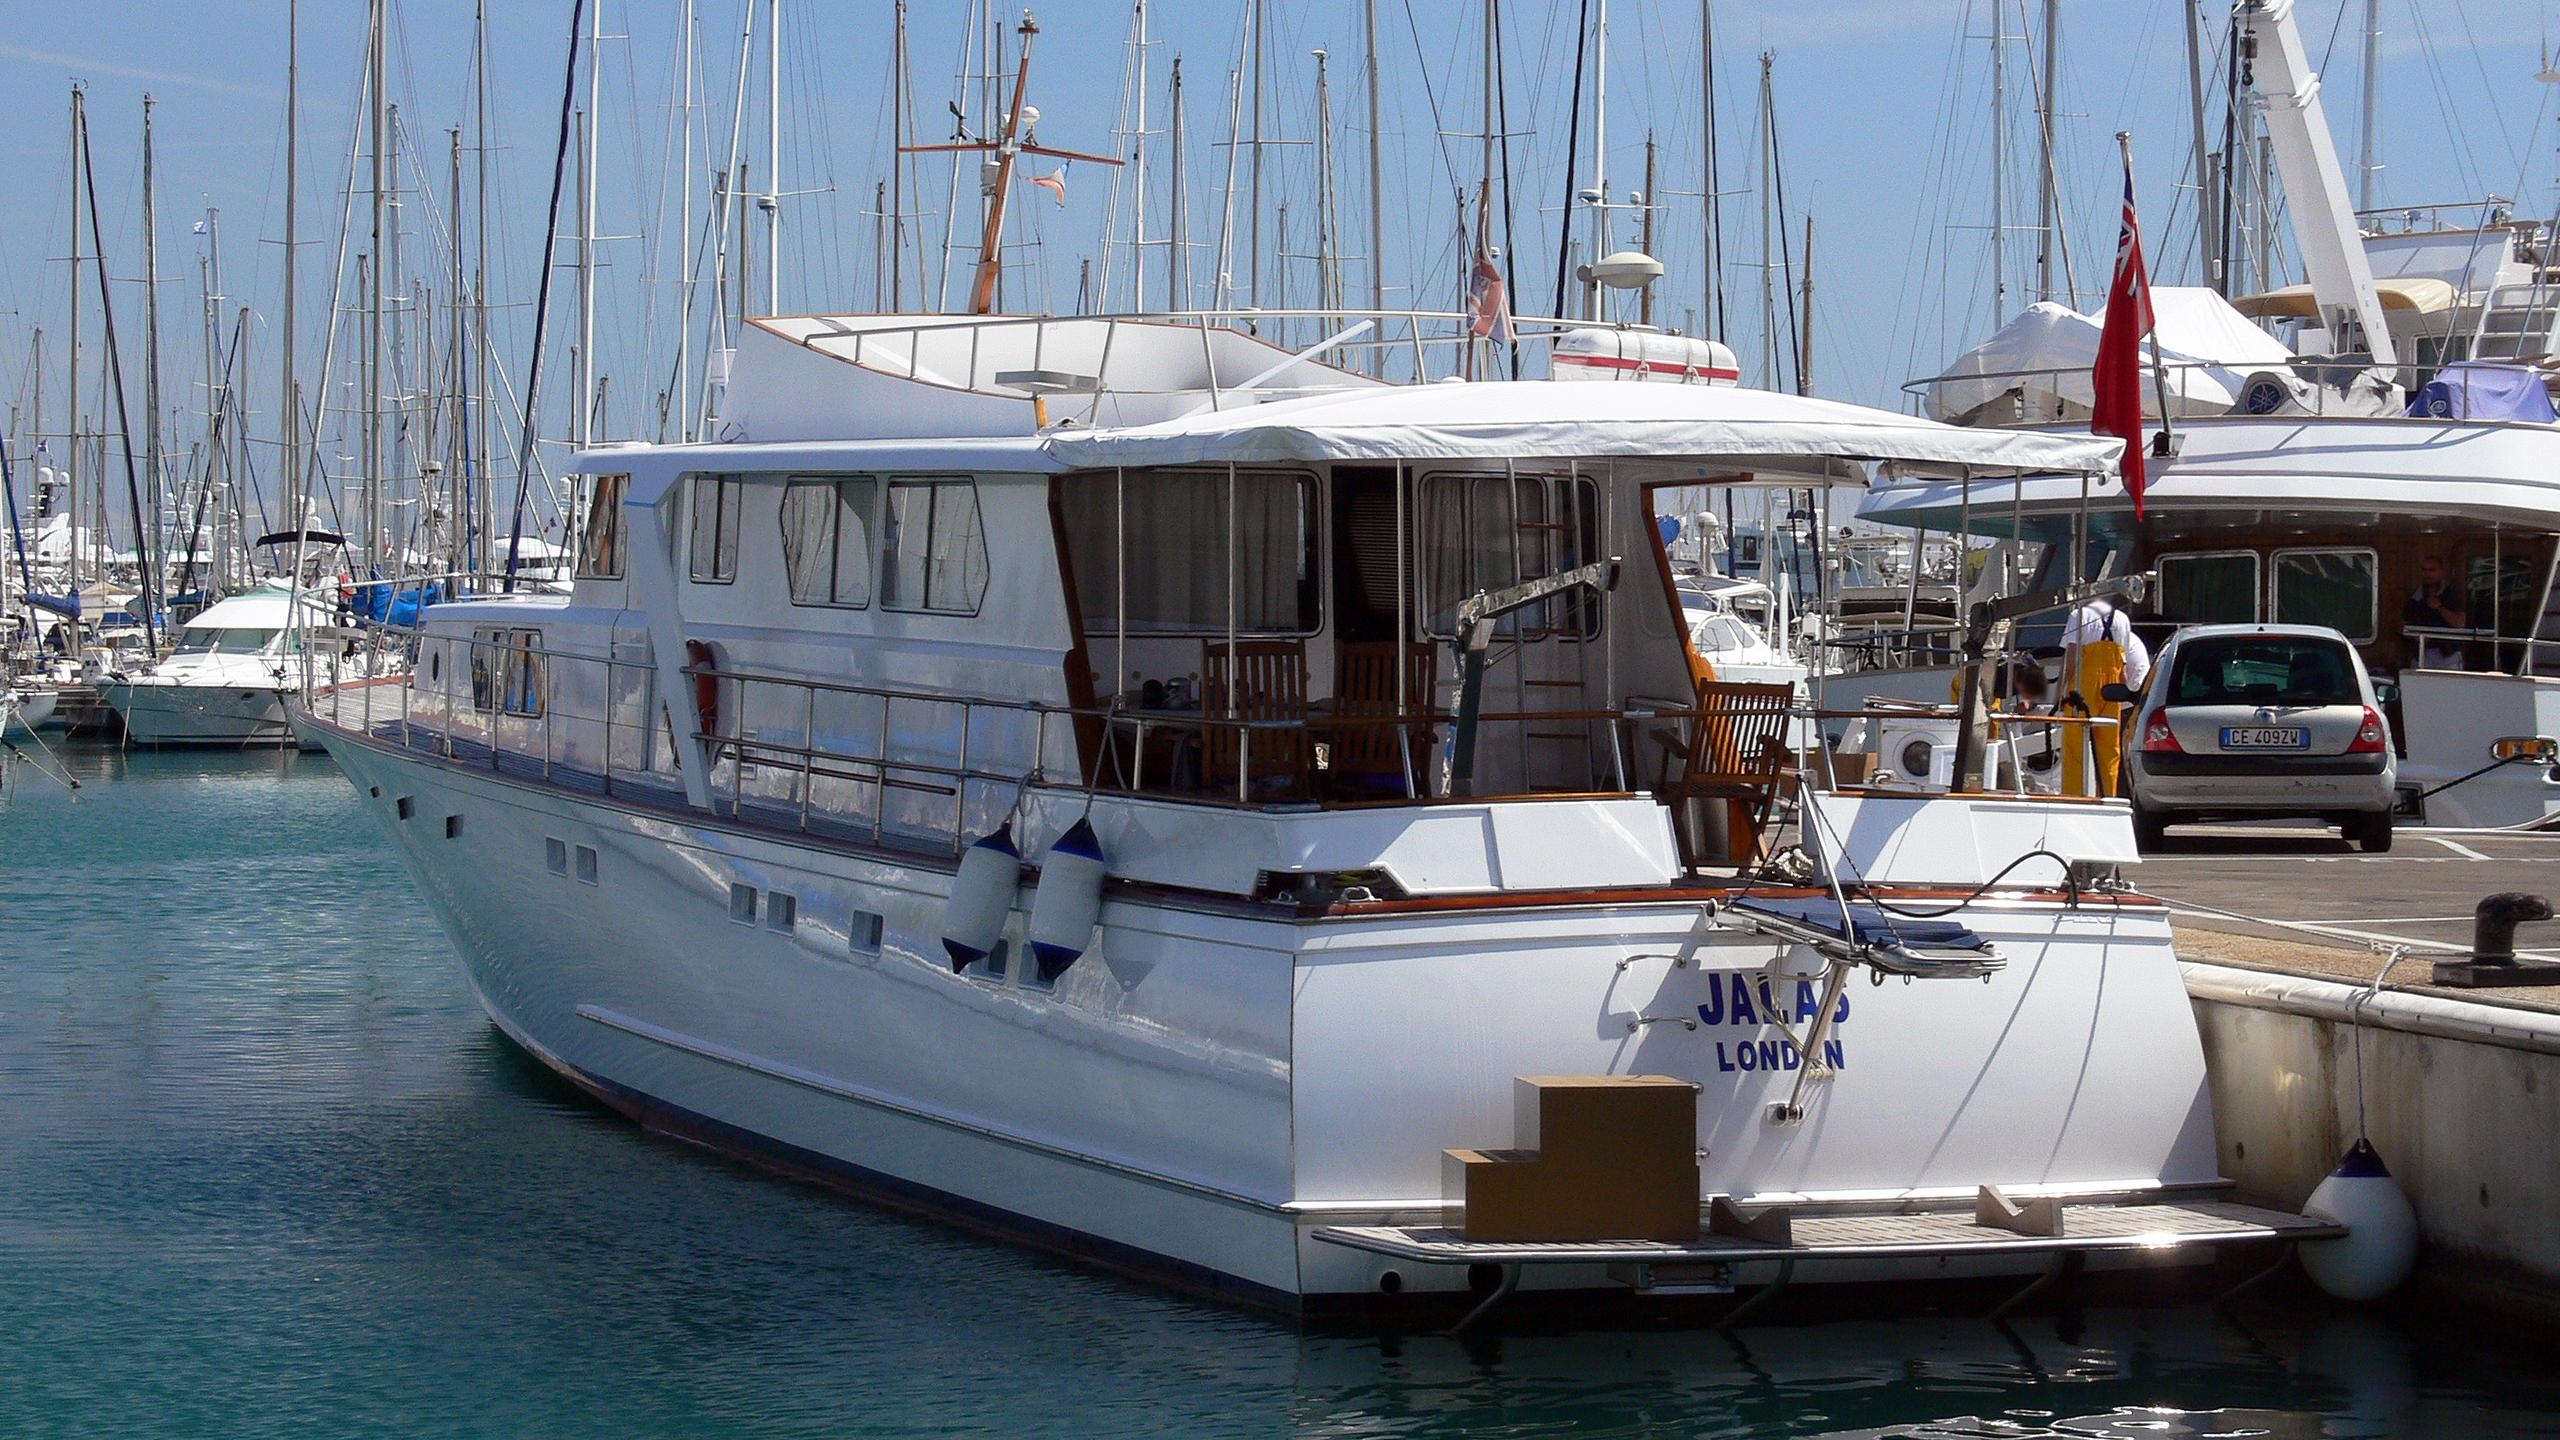 jalas-motor-yacht-esterel-26-1973-26m-stern